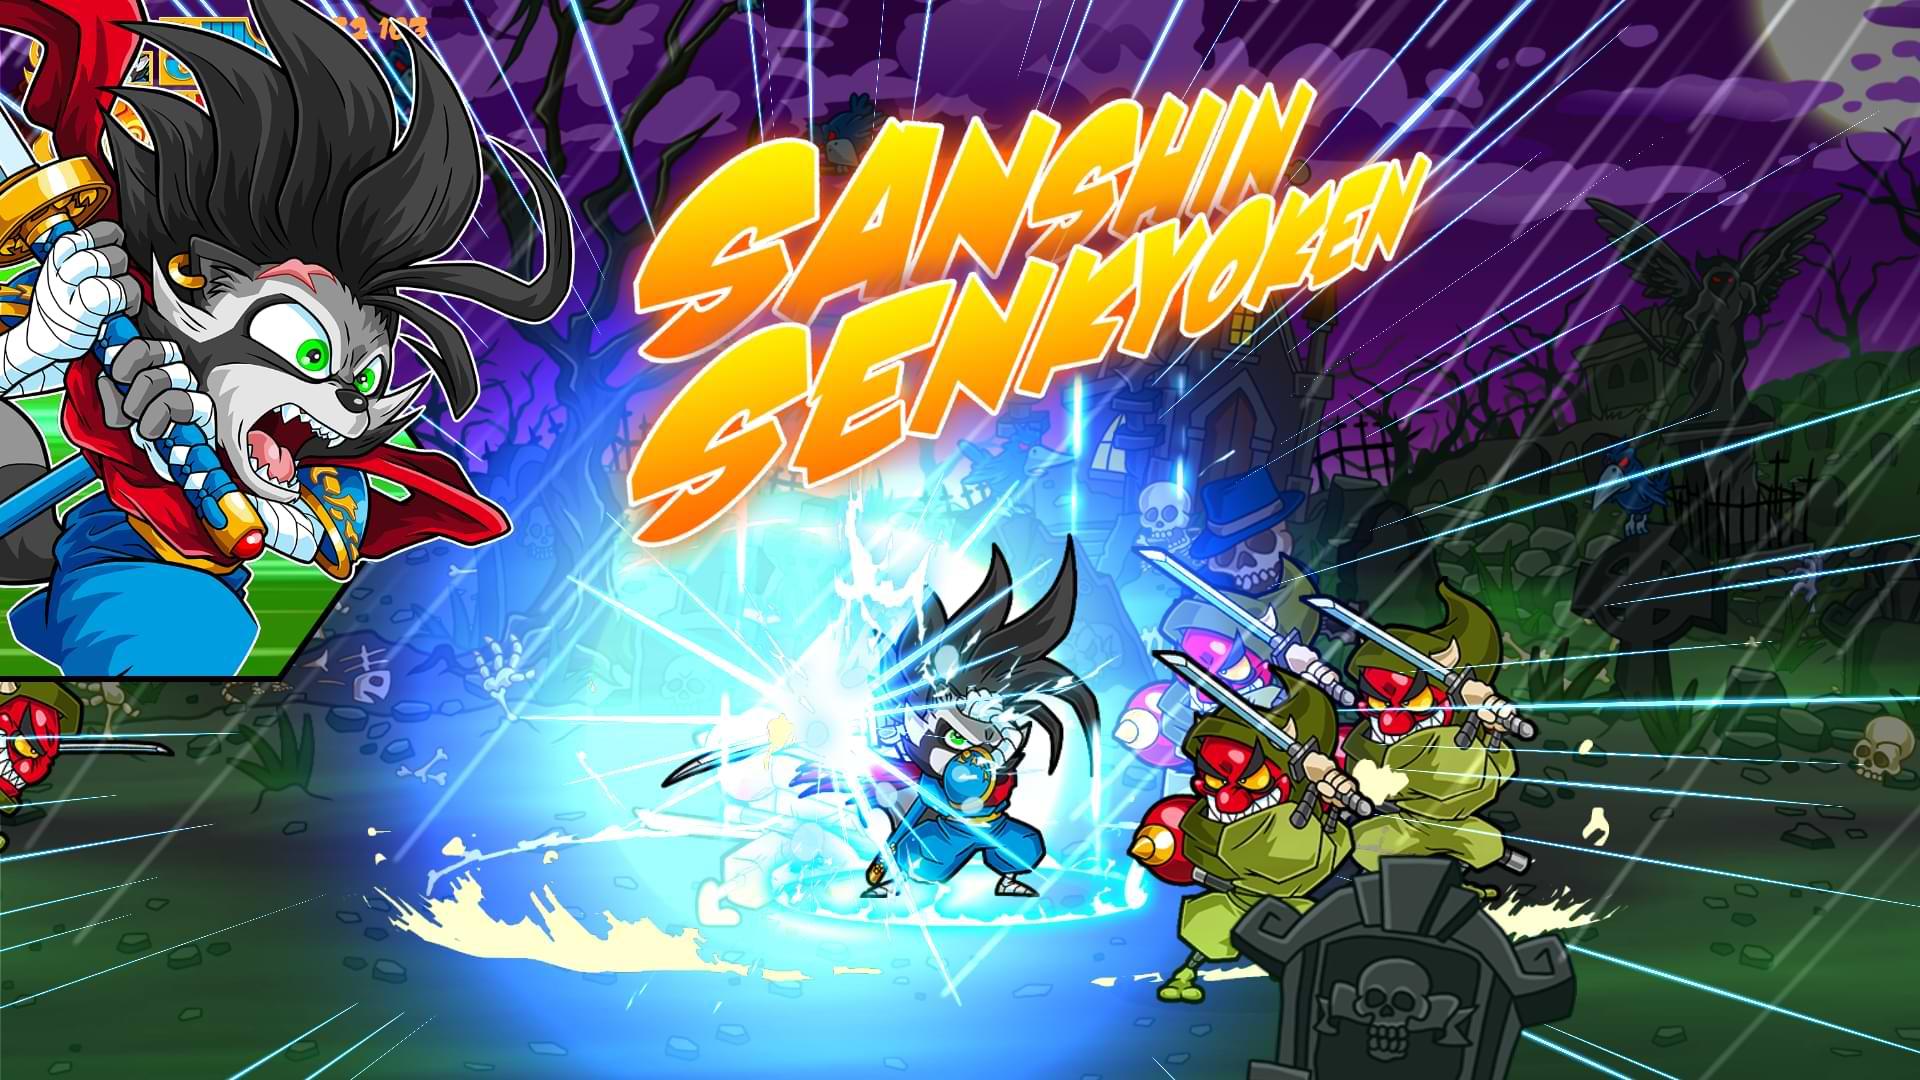 Jitsu Squad - Sanshin